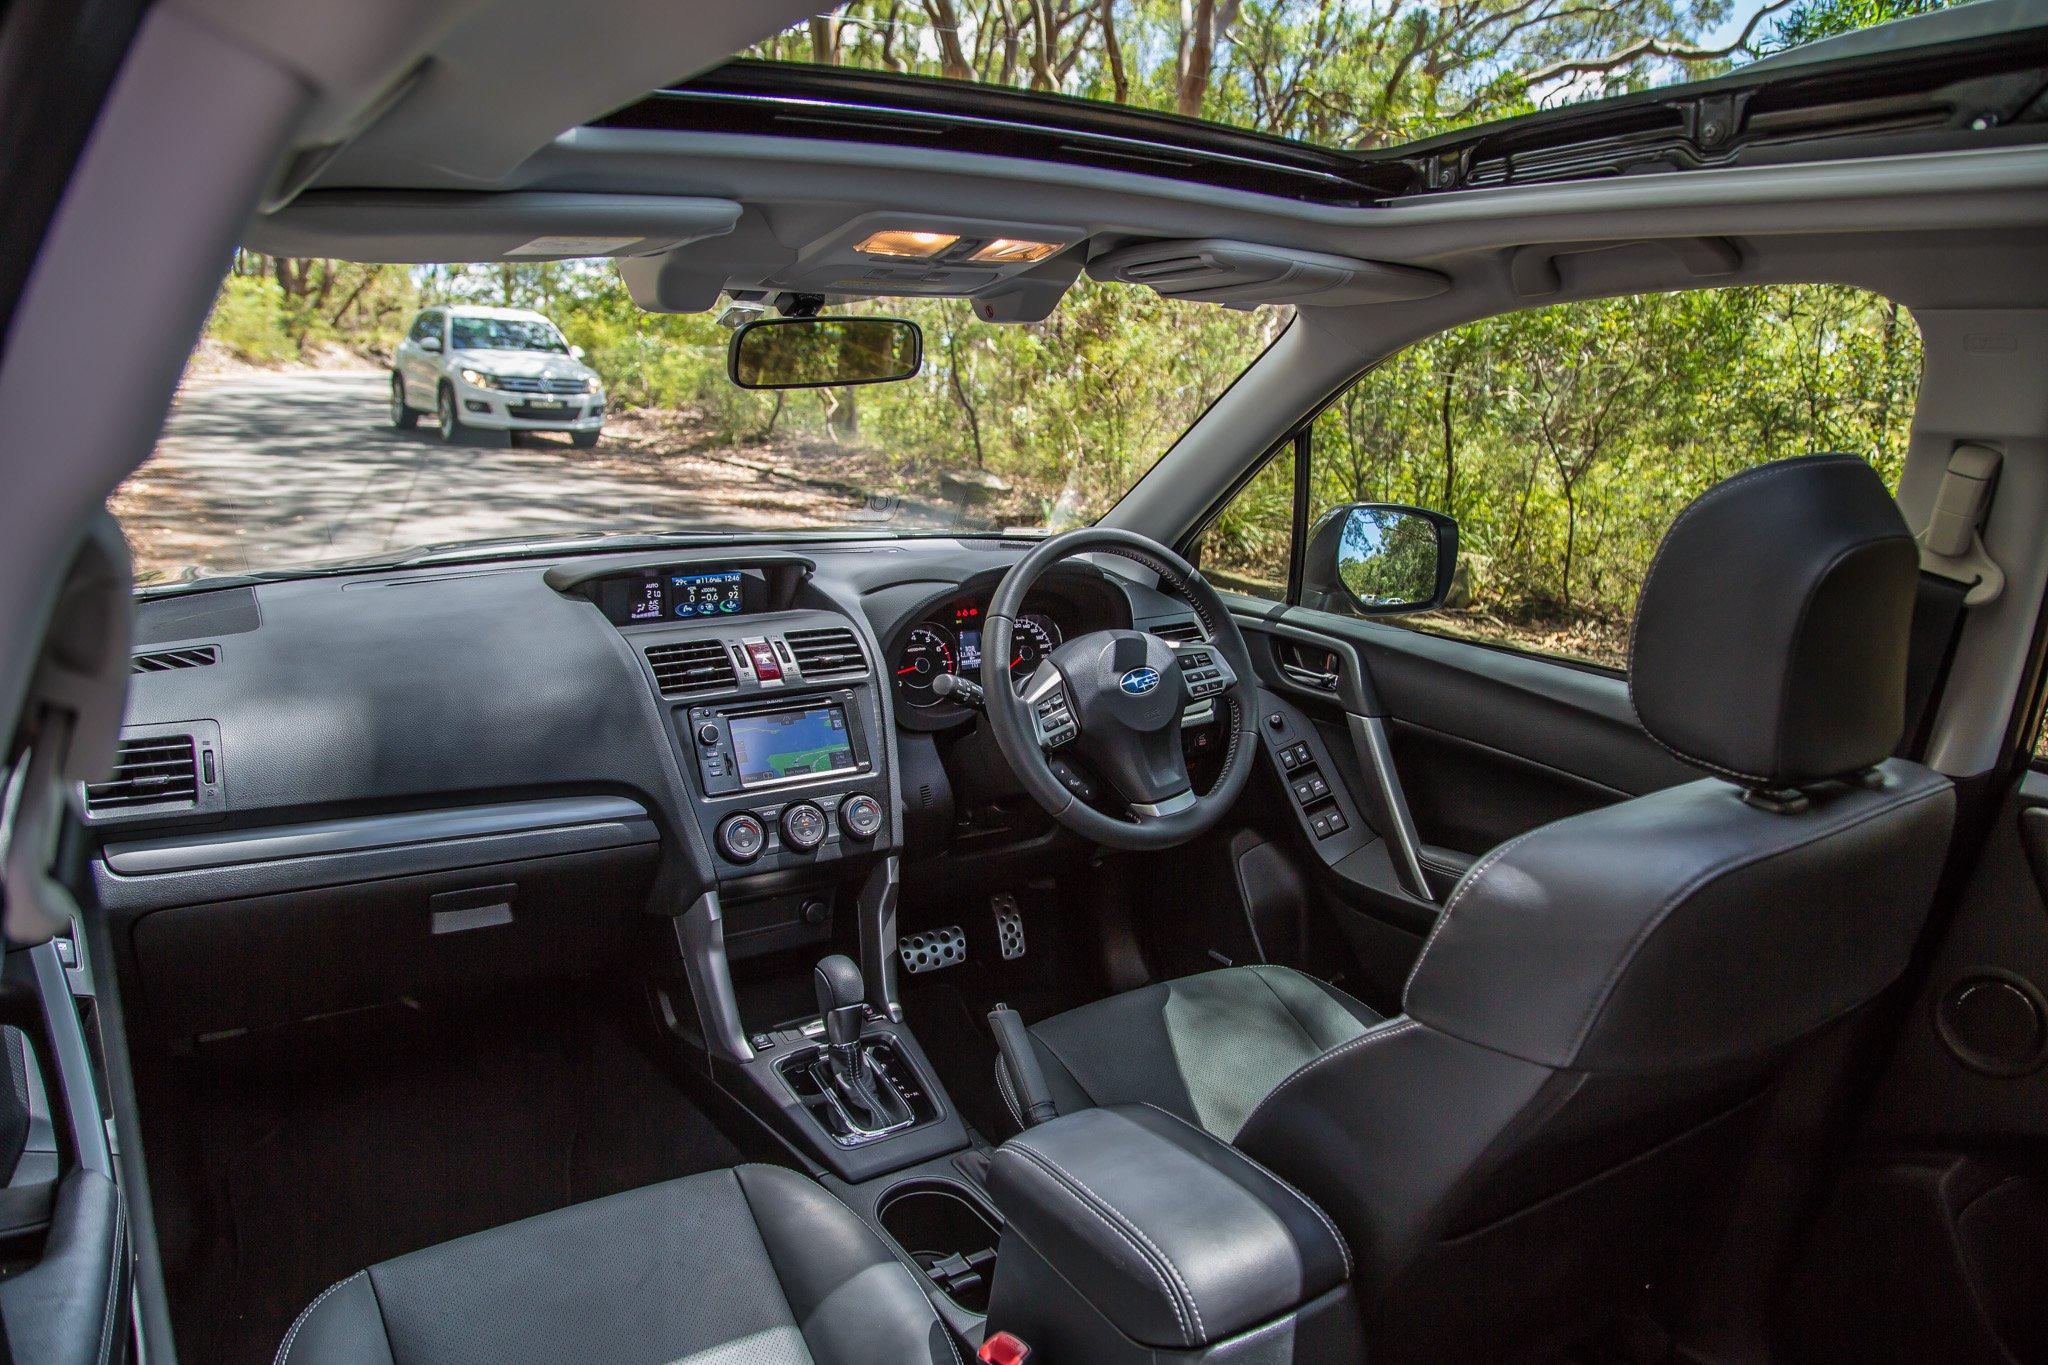 Medium SUV Comparison : Ford Kuga v Mazda CX-5 v Subaru